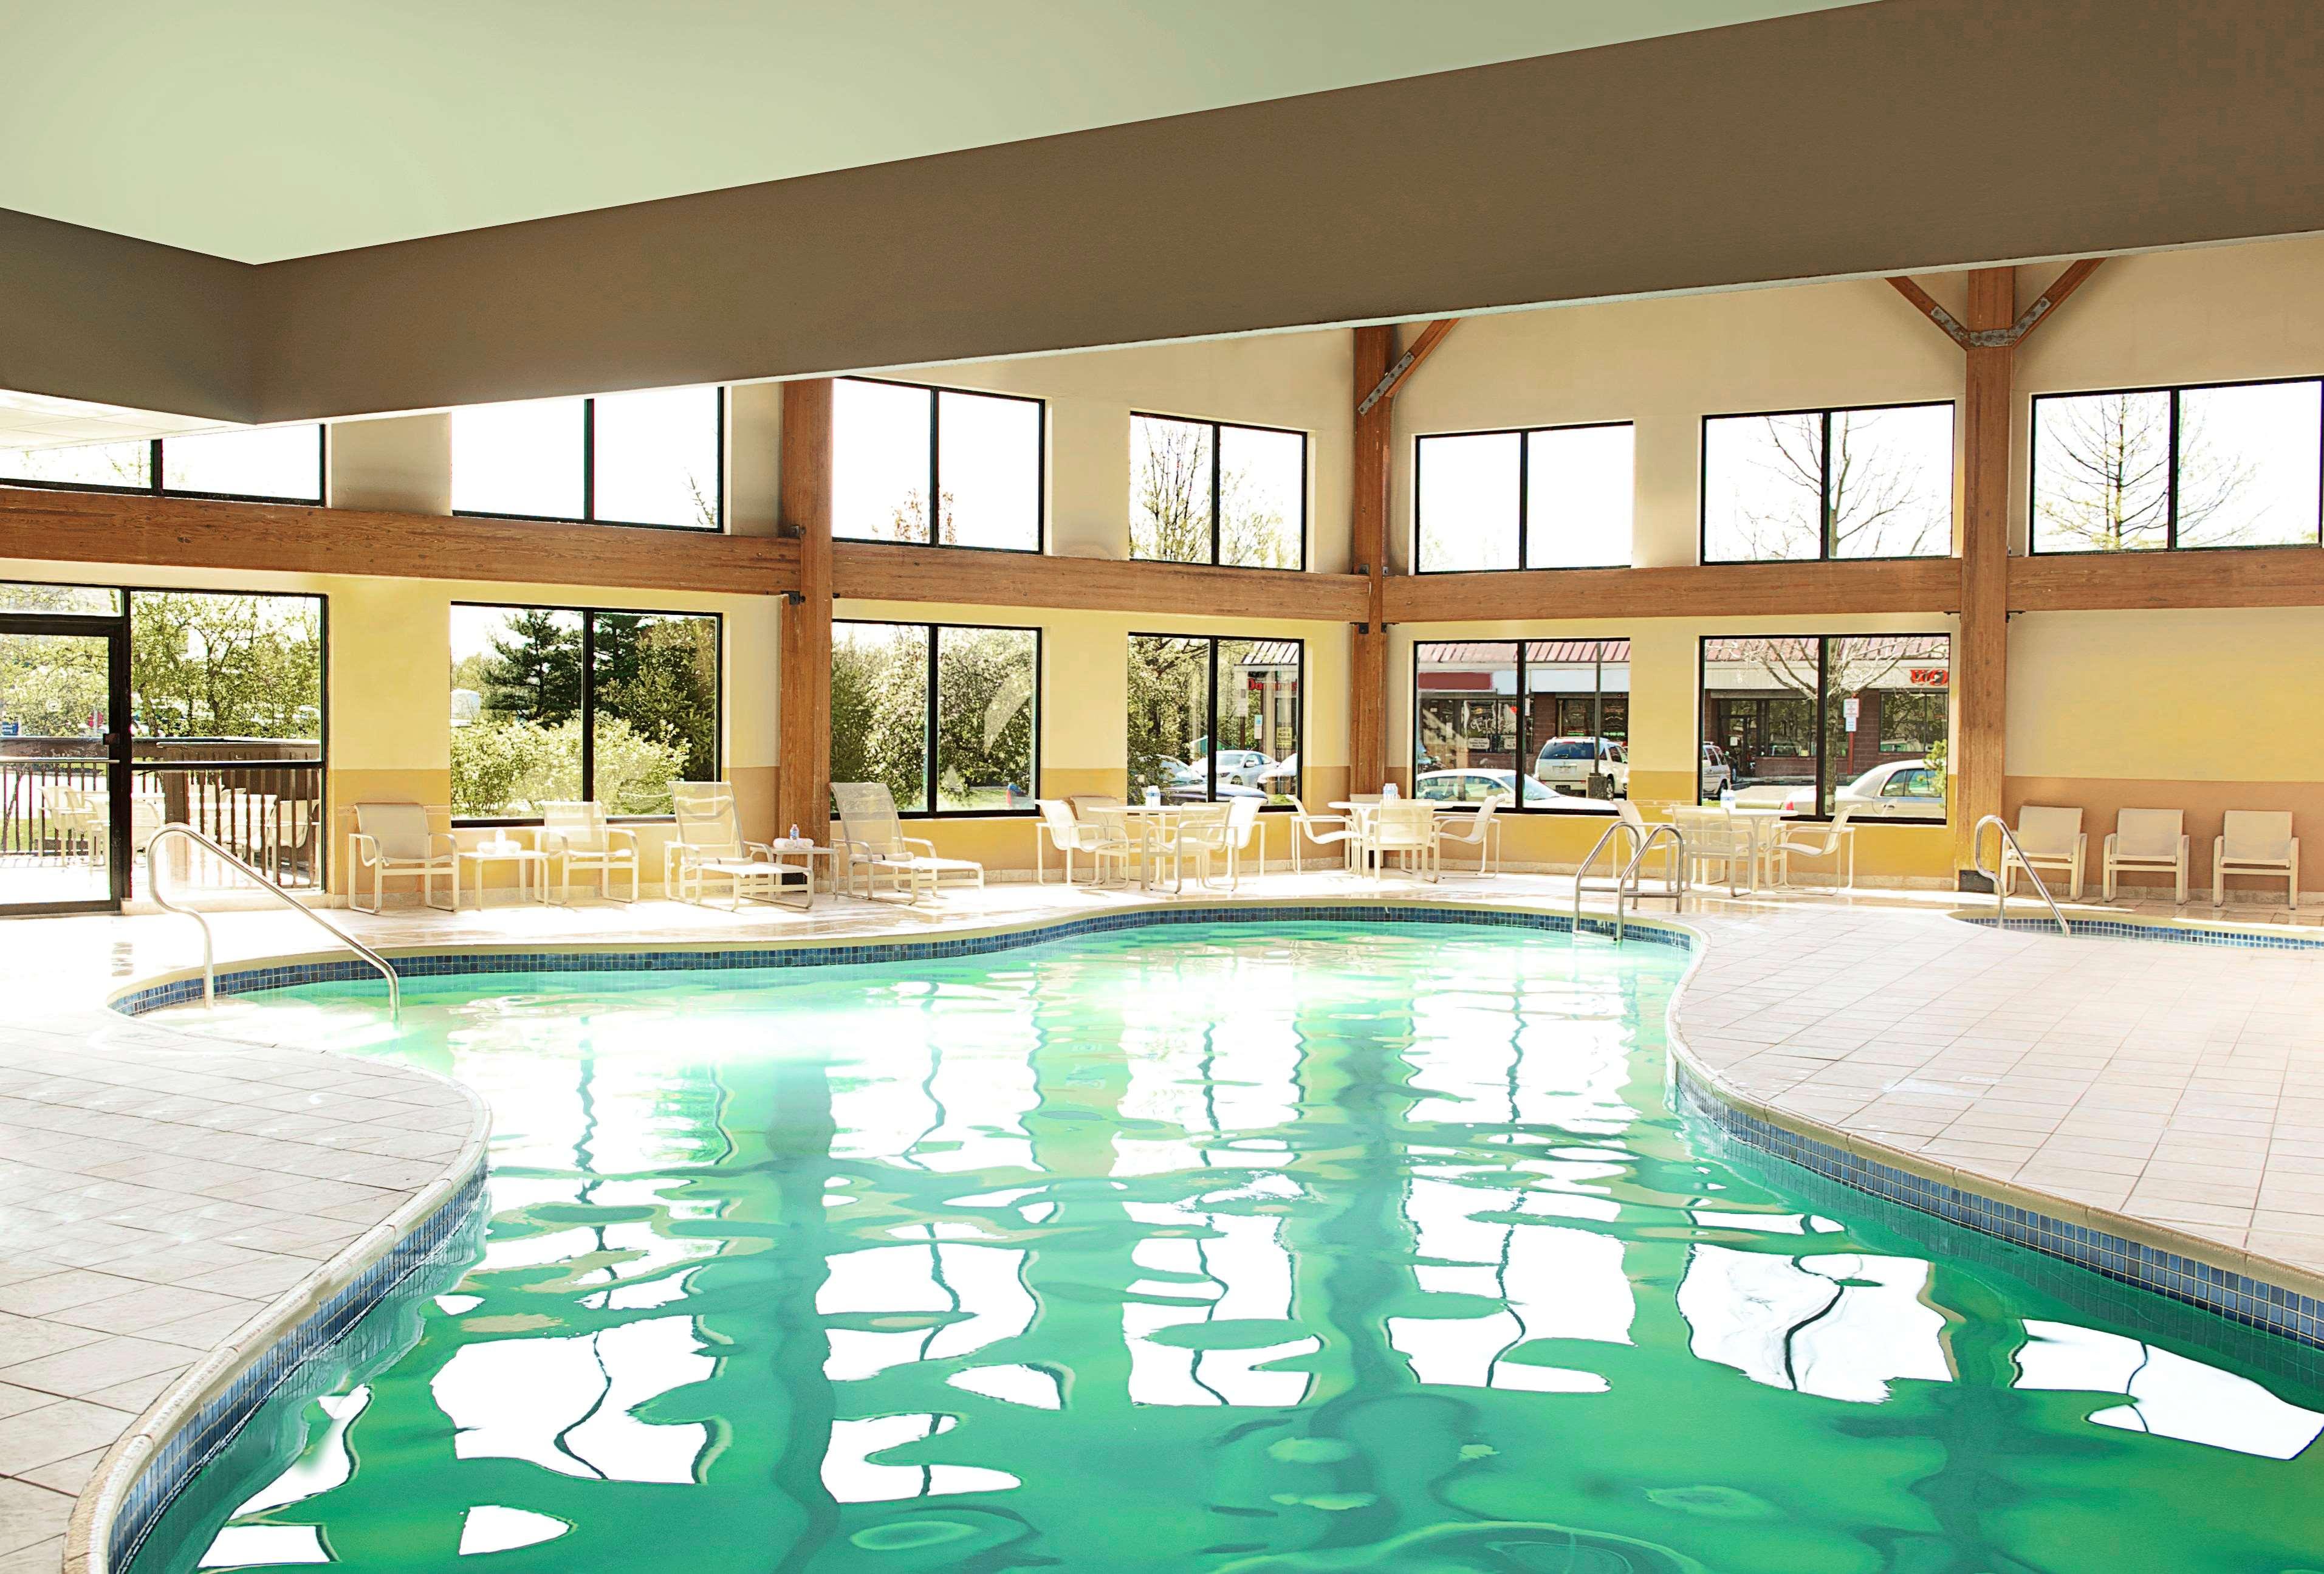 Sheraton Bucks County Hotel In Langhorne Pa 215 547 4